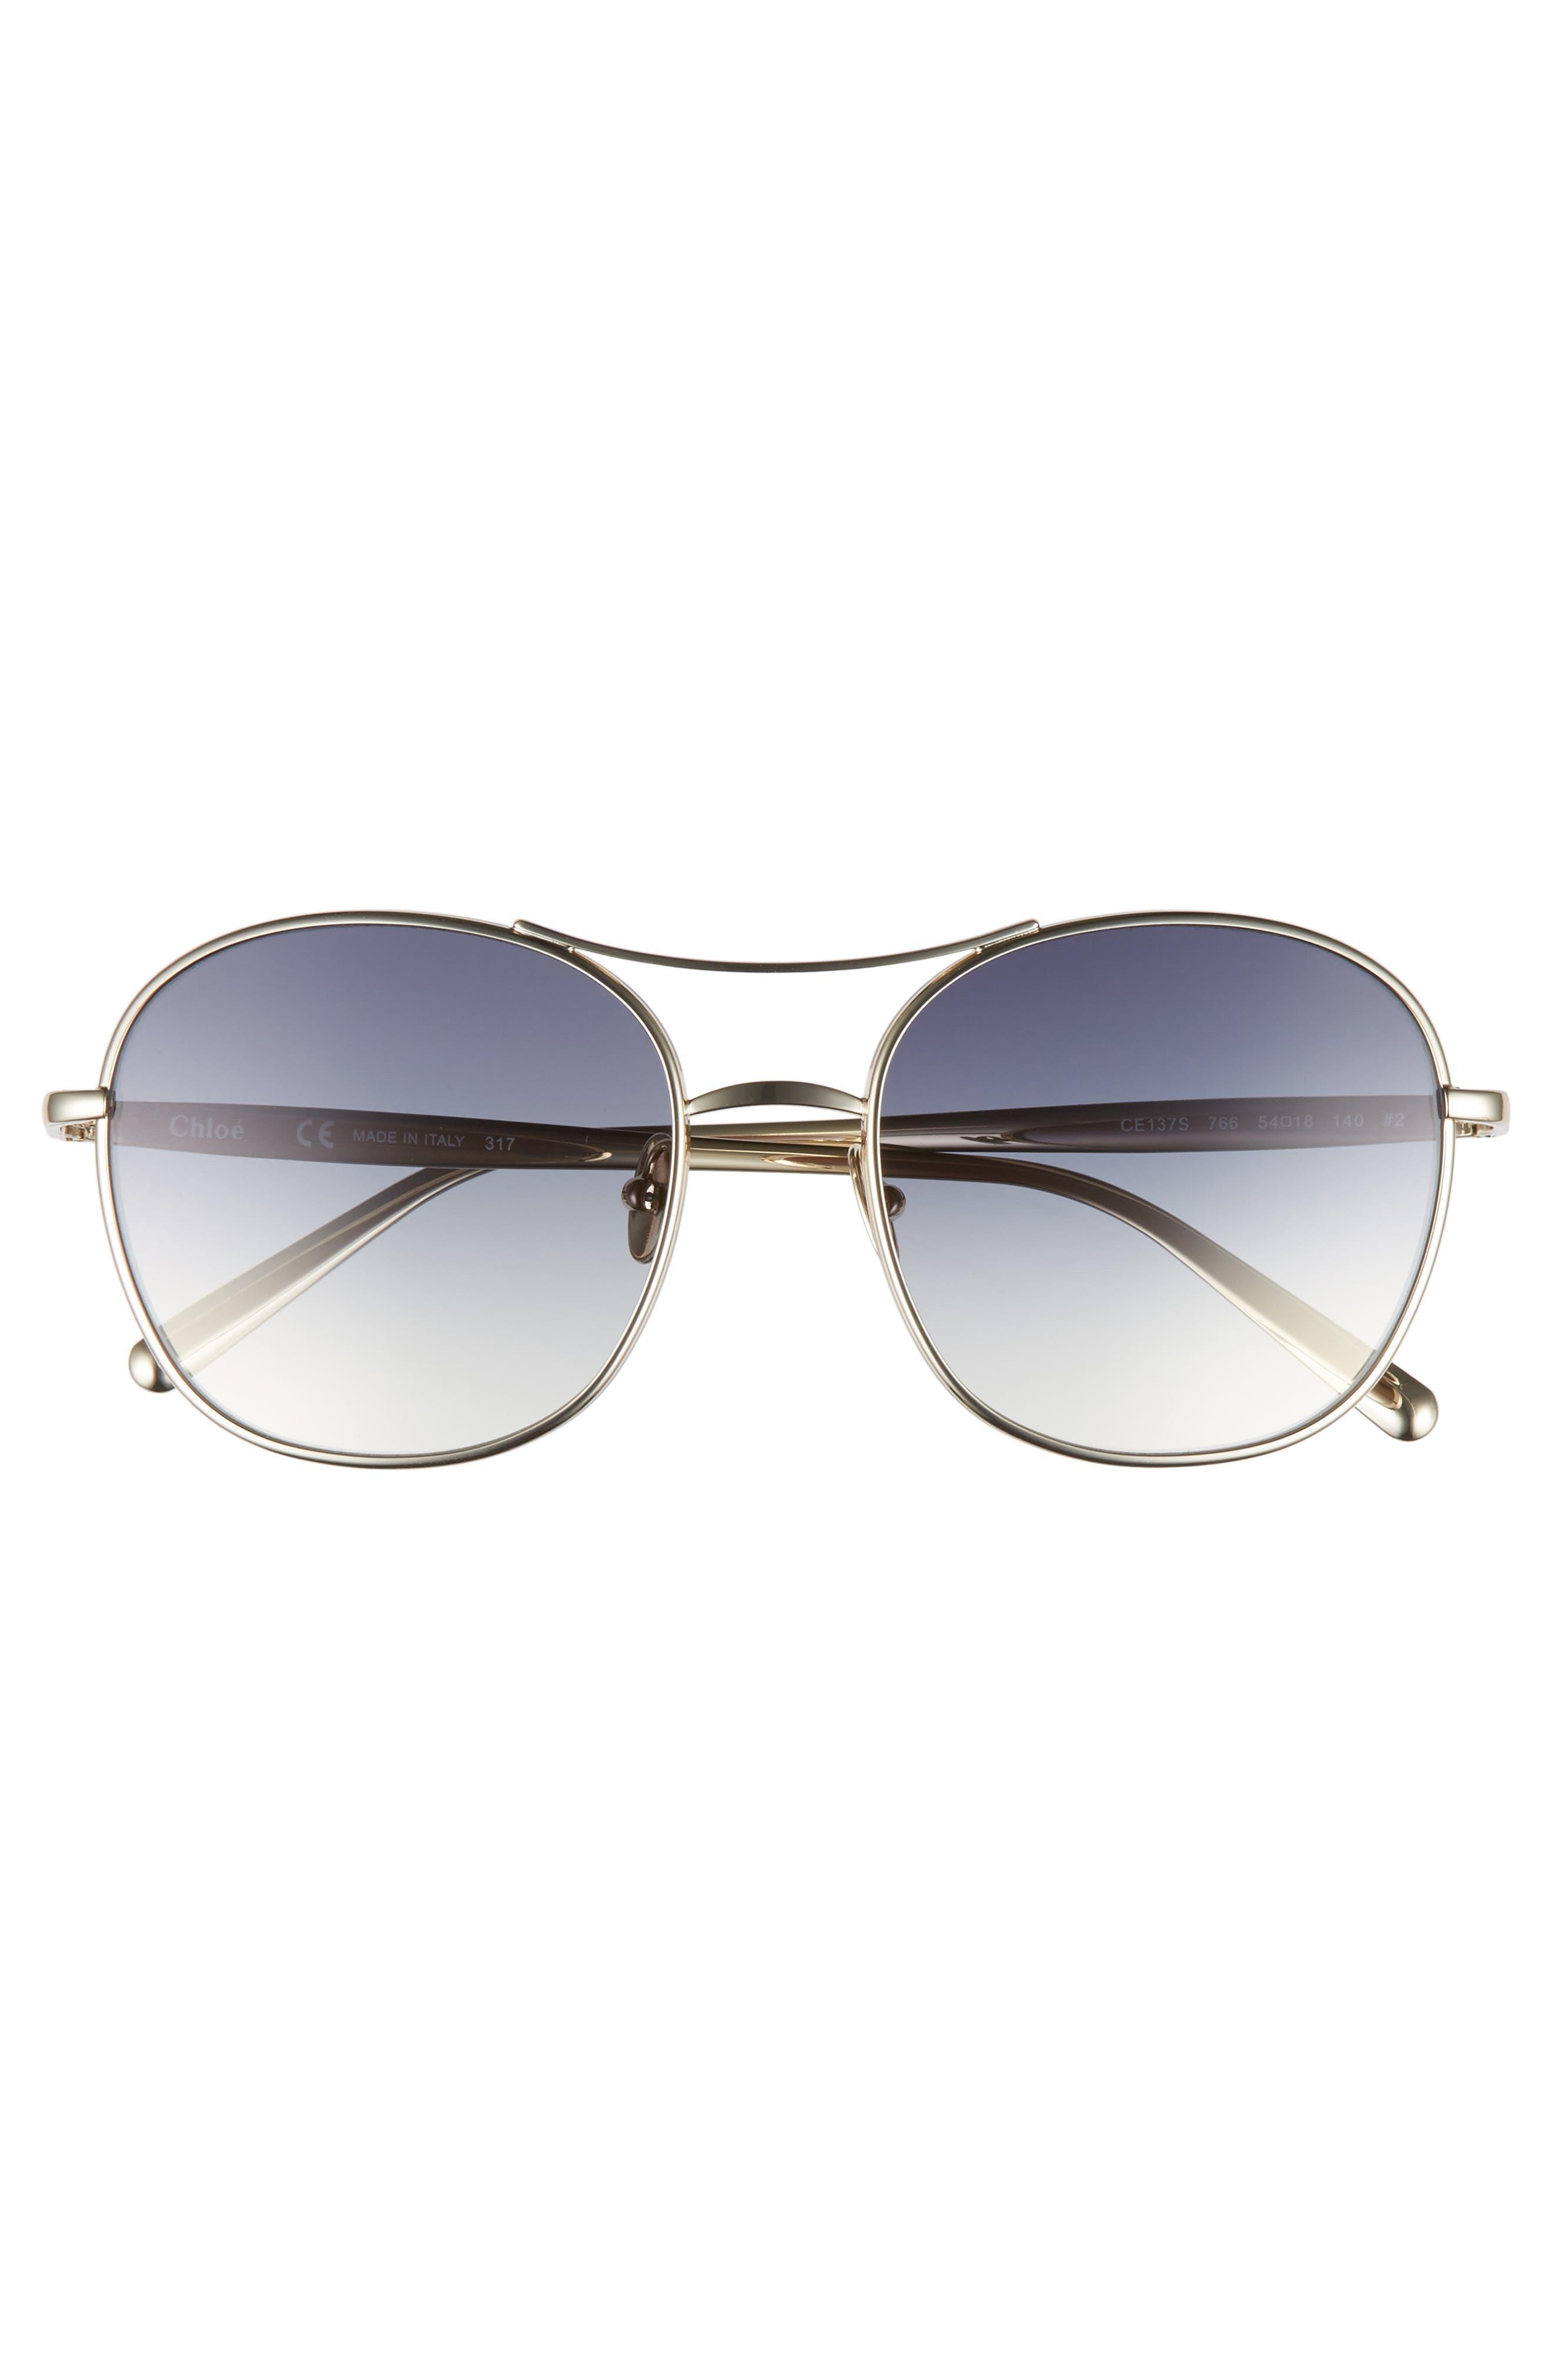 54mm Aviator Sunglasses,                             Alternate thumbnail 3, color,                             710